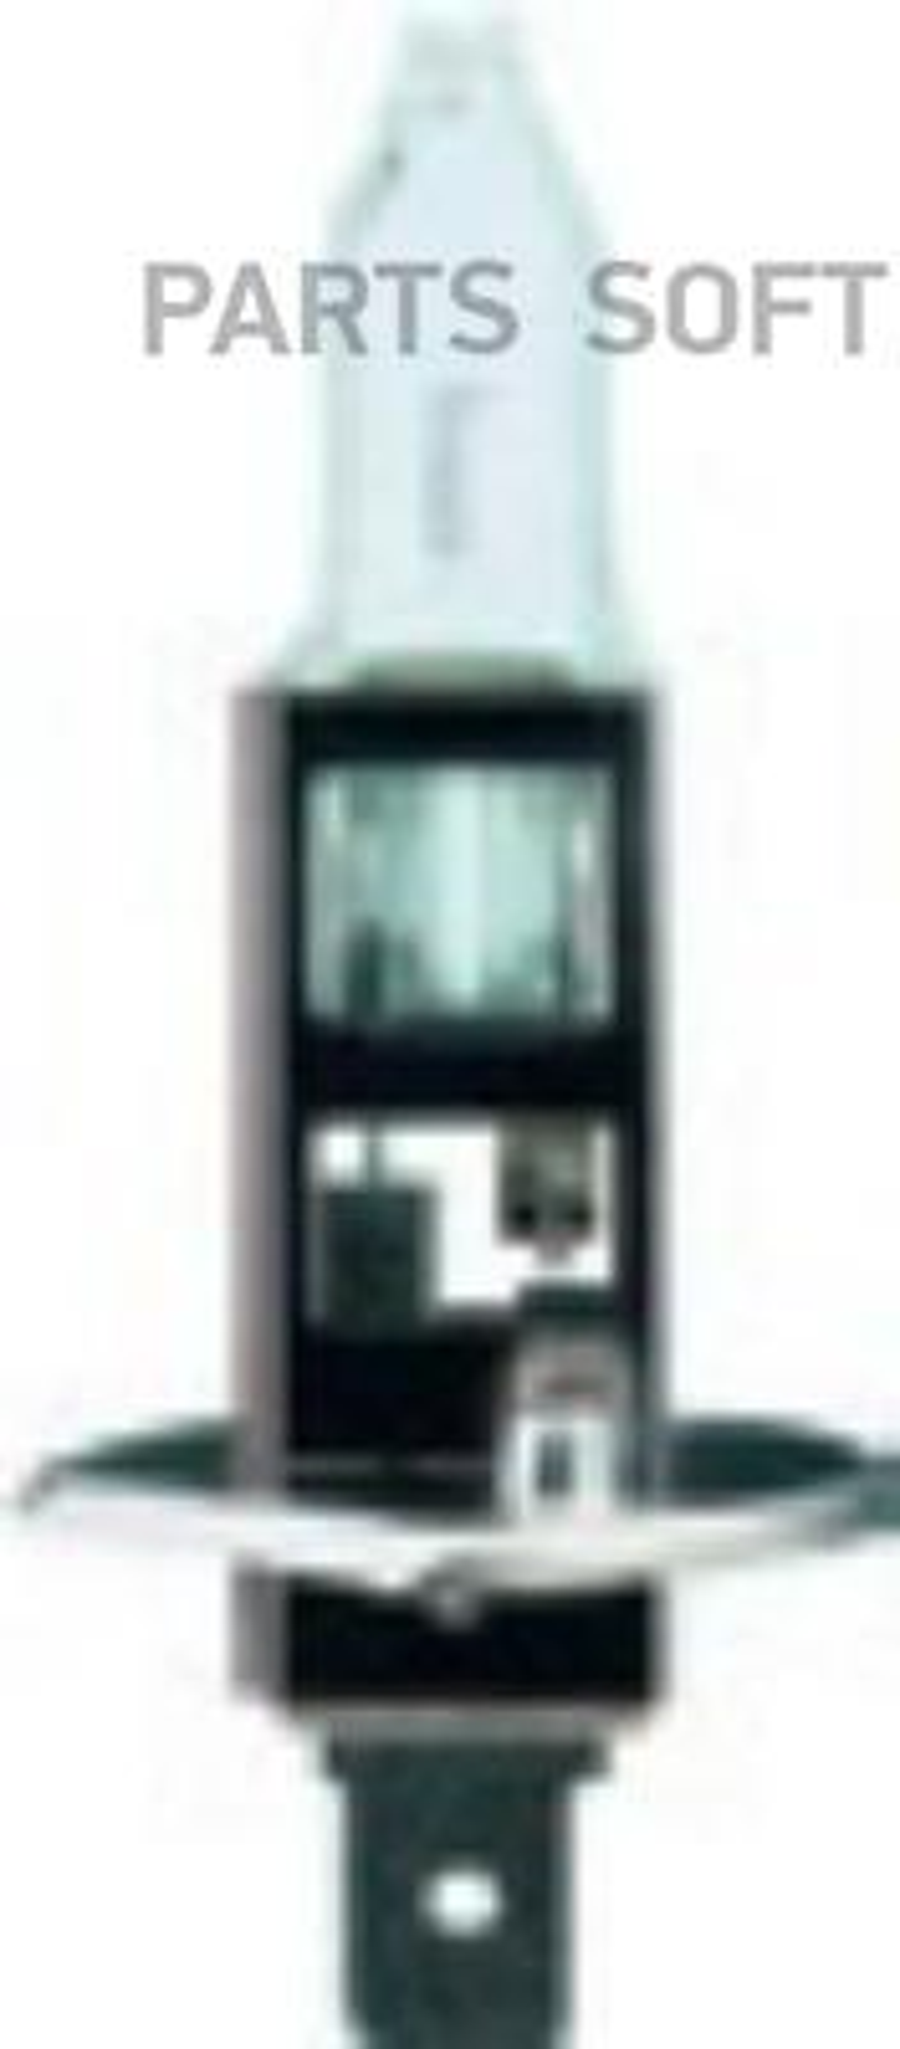 Лампа галоген Rallye High power performance for closed circuits only H1 12В 100Вт